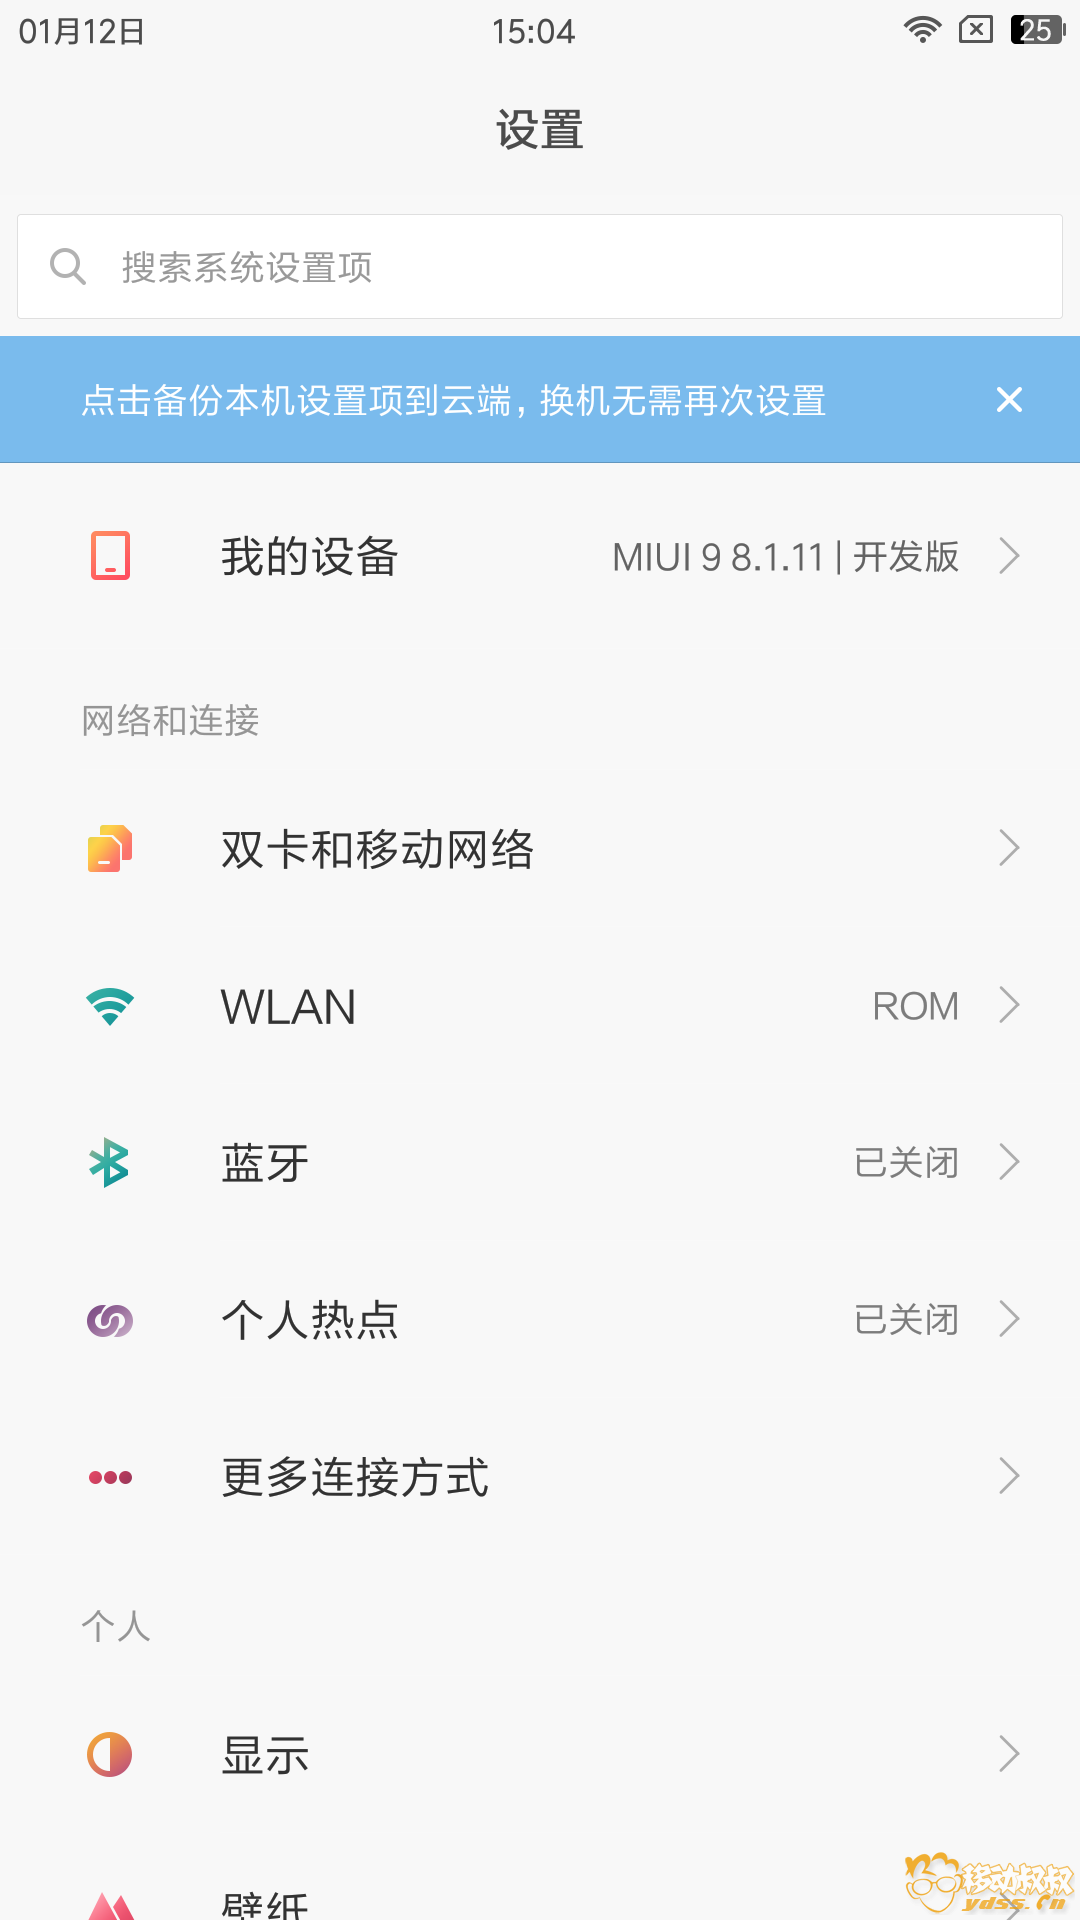 Screenshot_2018-01-12-15-04-25-938_com.android.settings[2].png